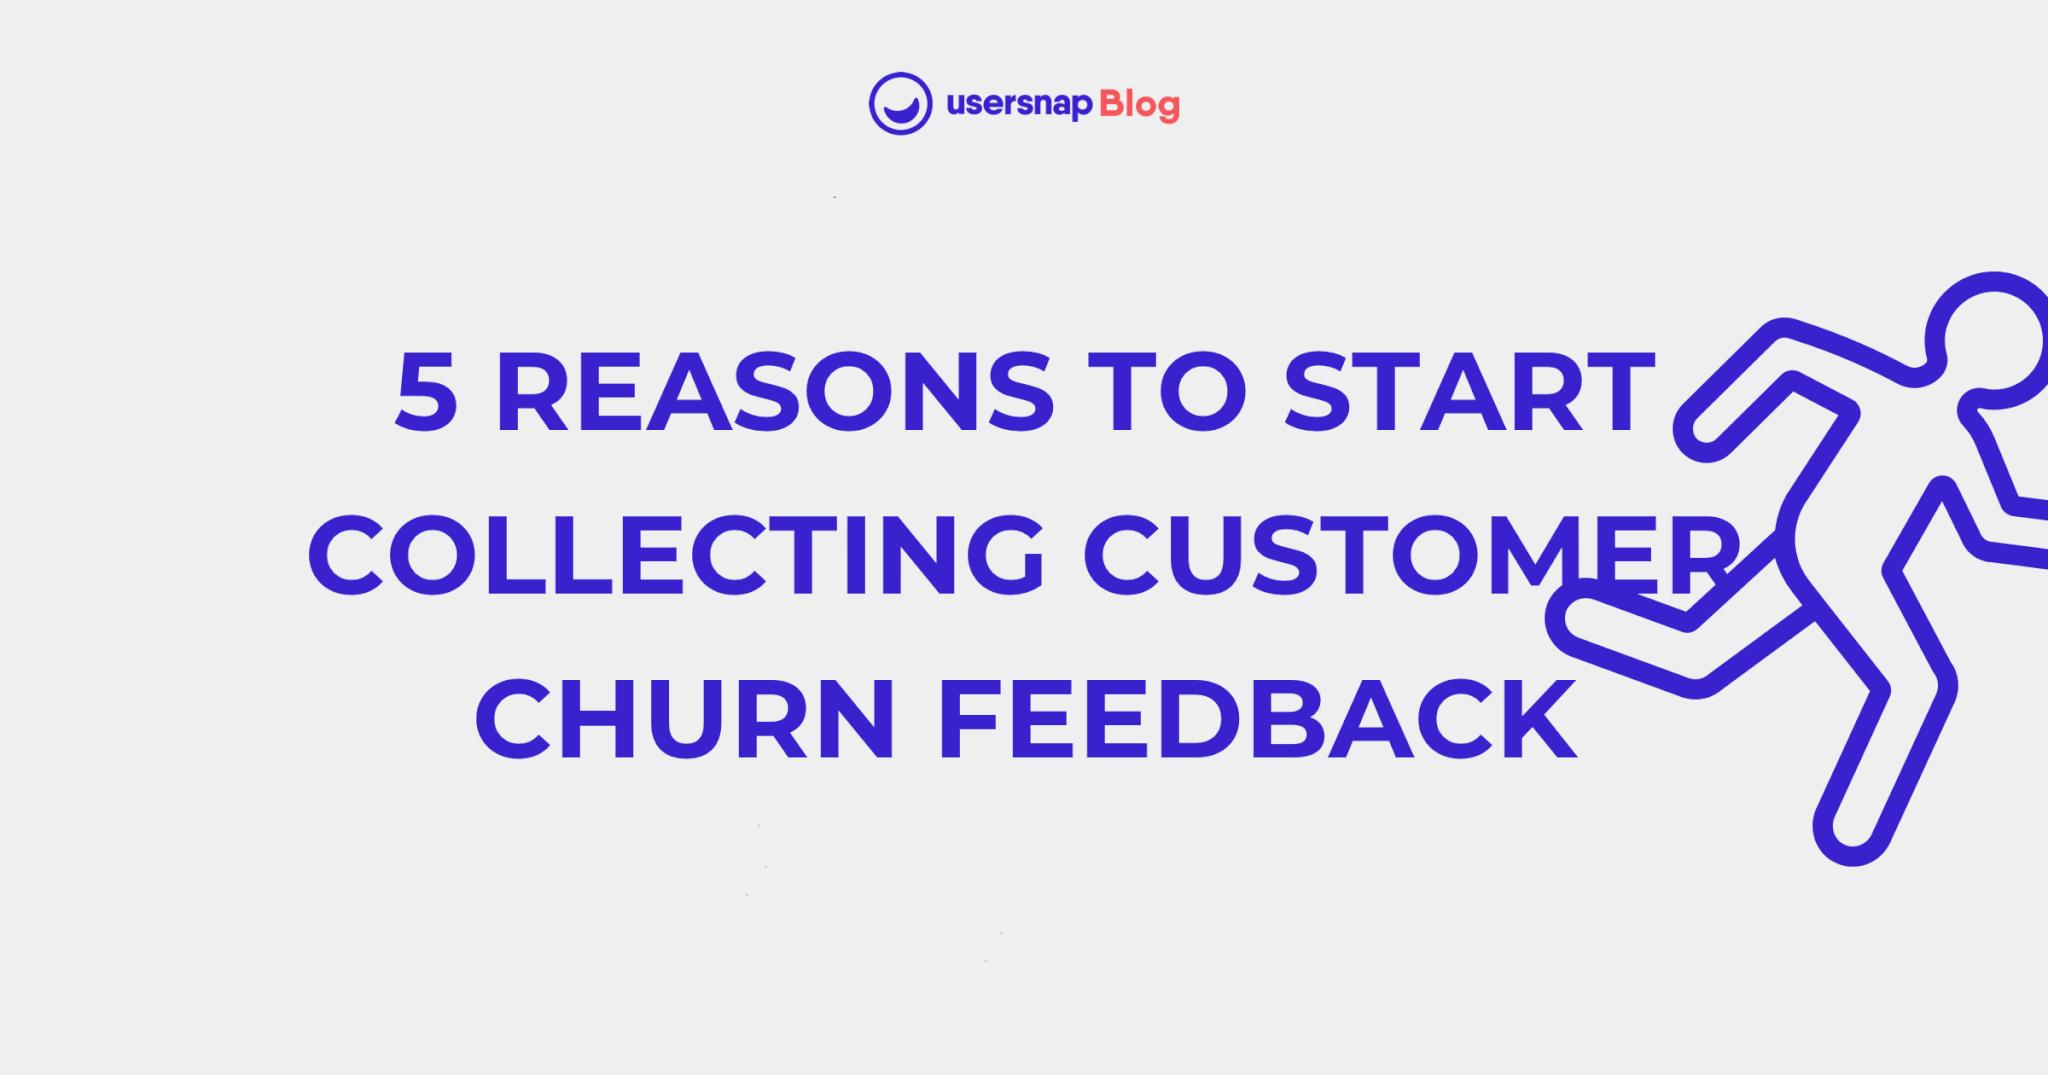 5 reasons to start collecting customer churn feedback Usersnap Blog